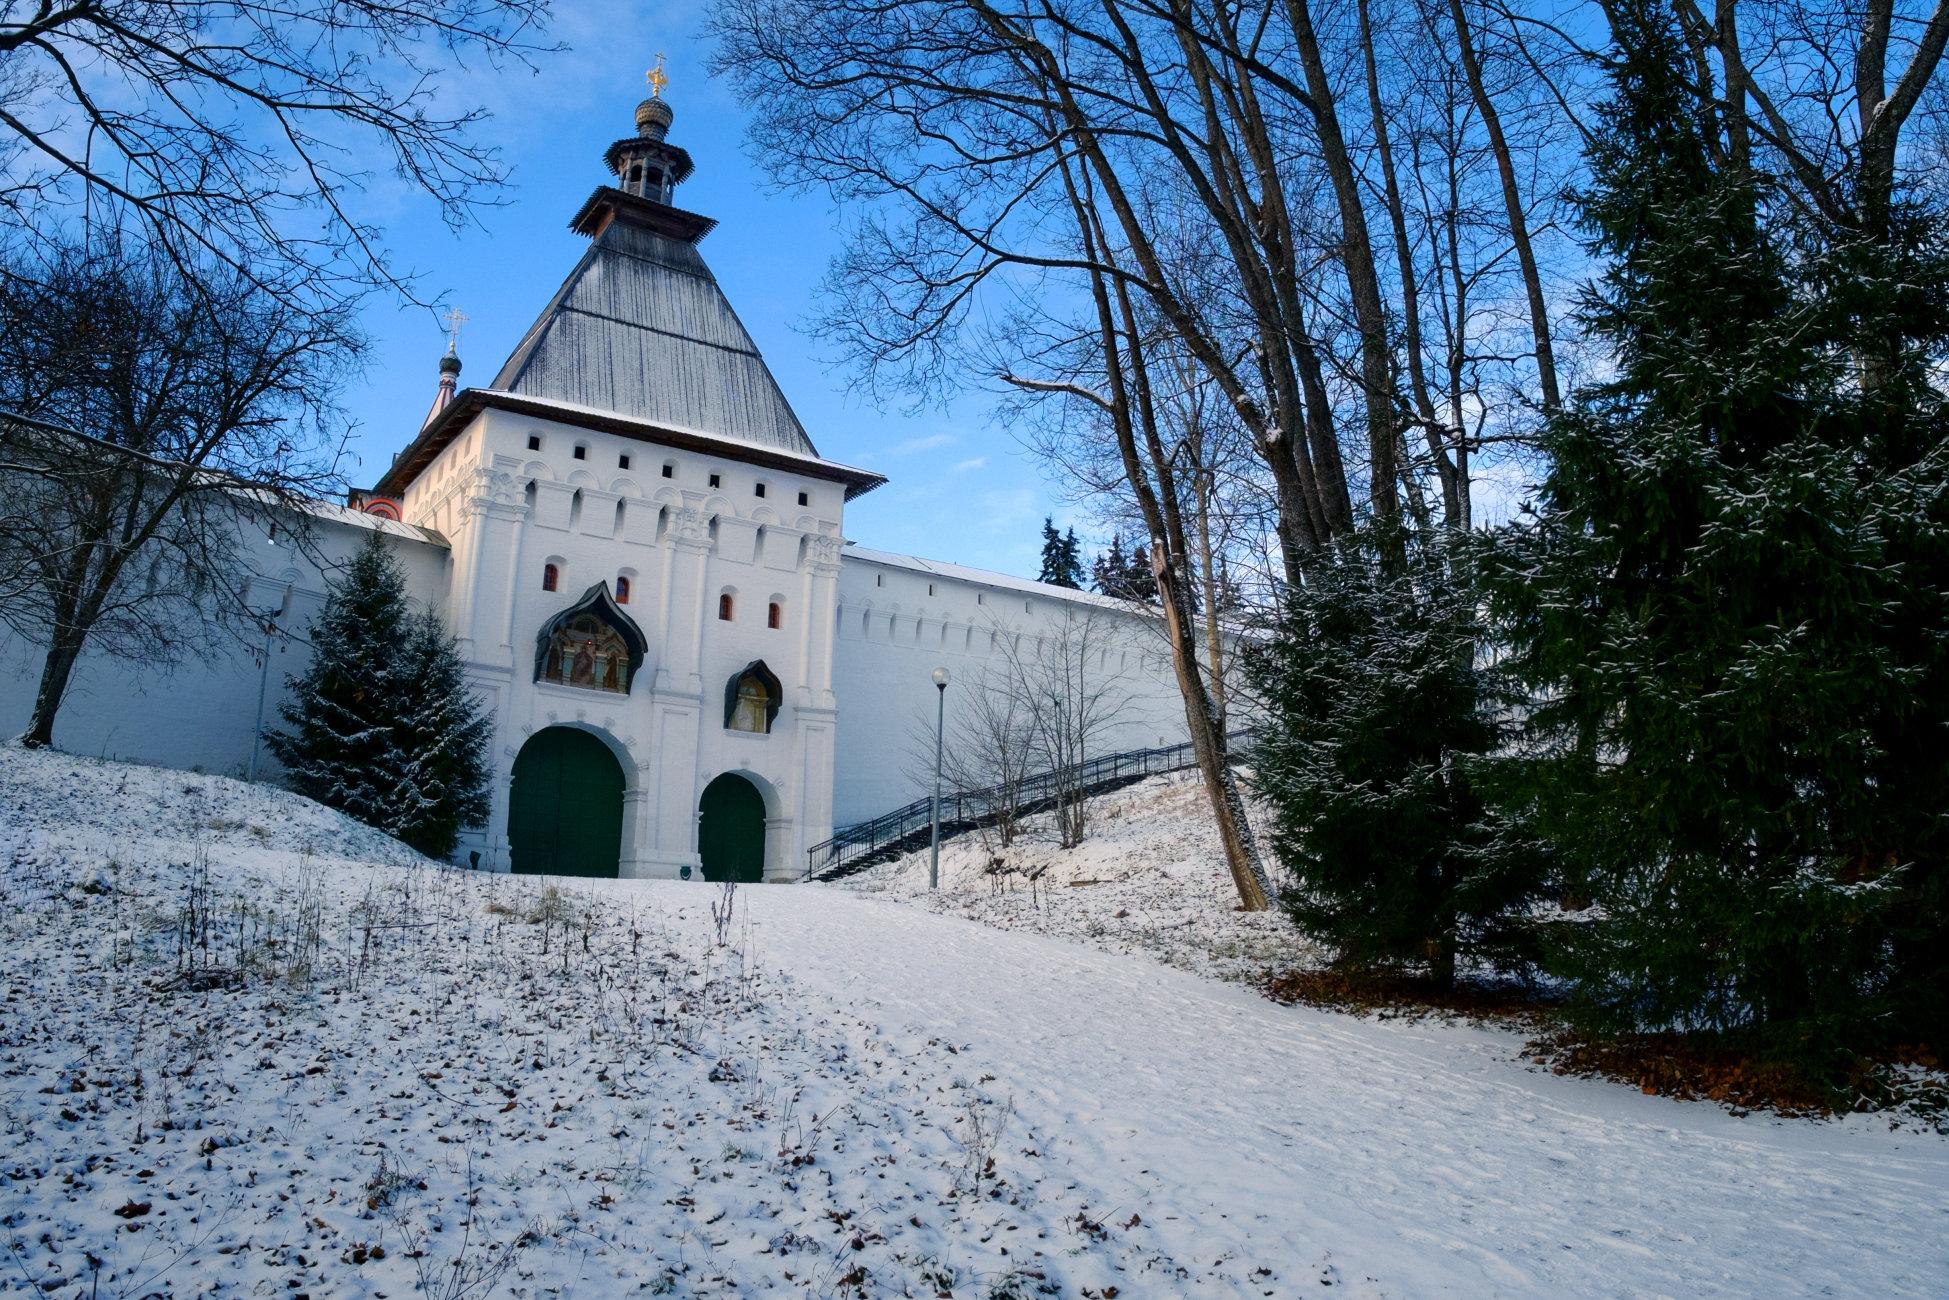 BellCity Monastery